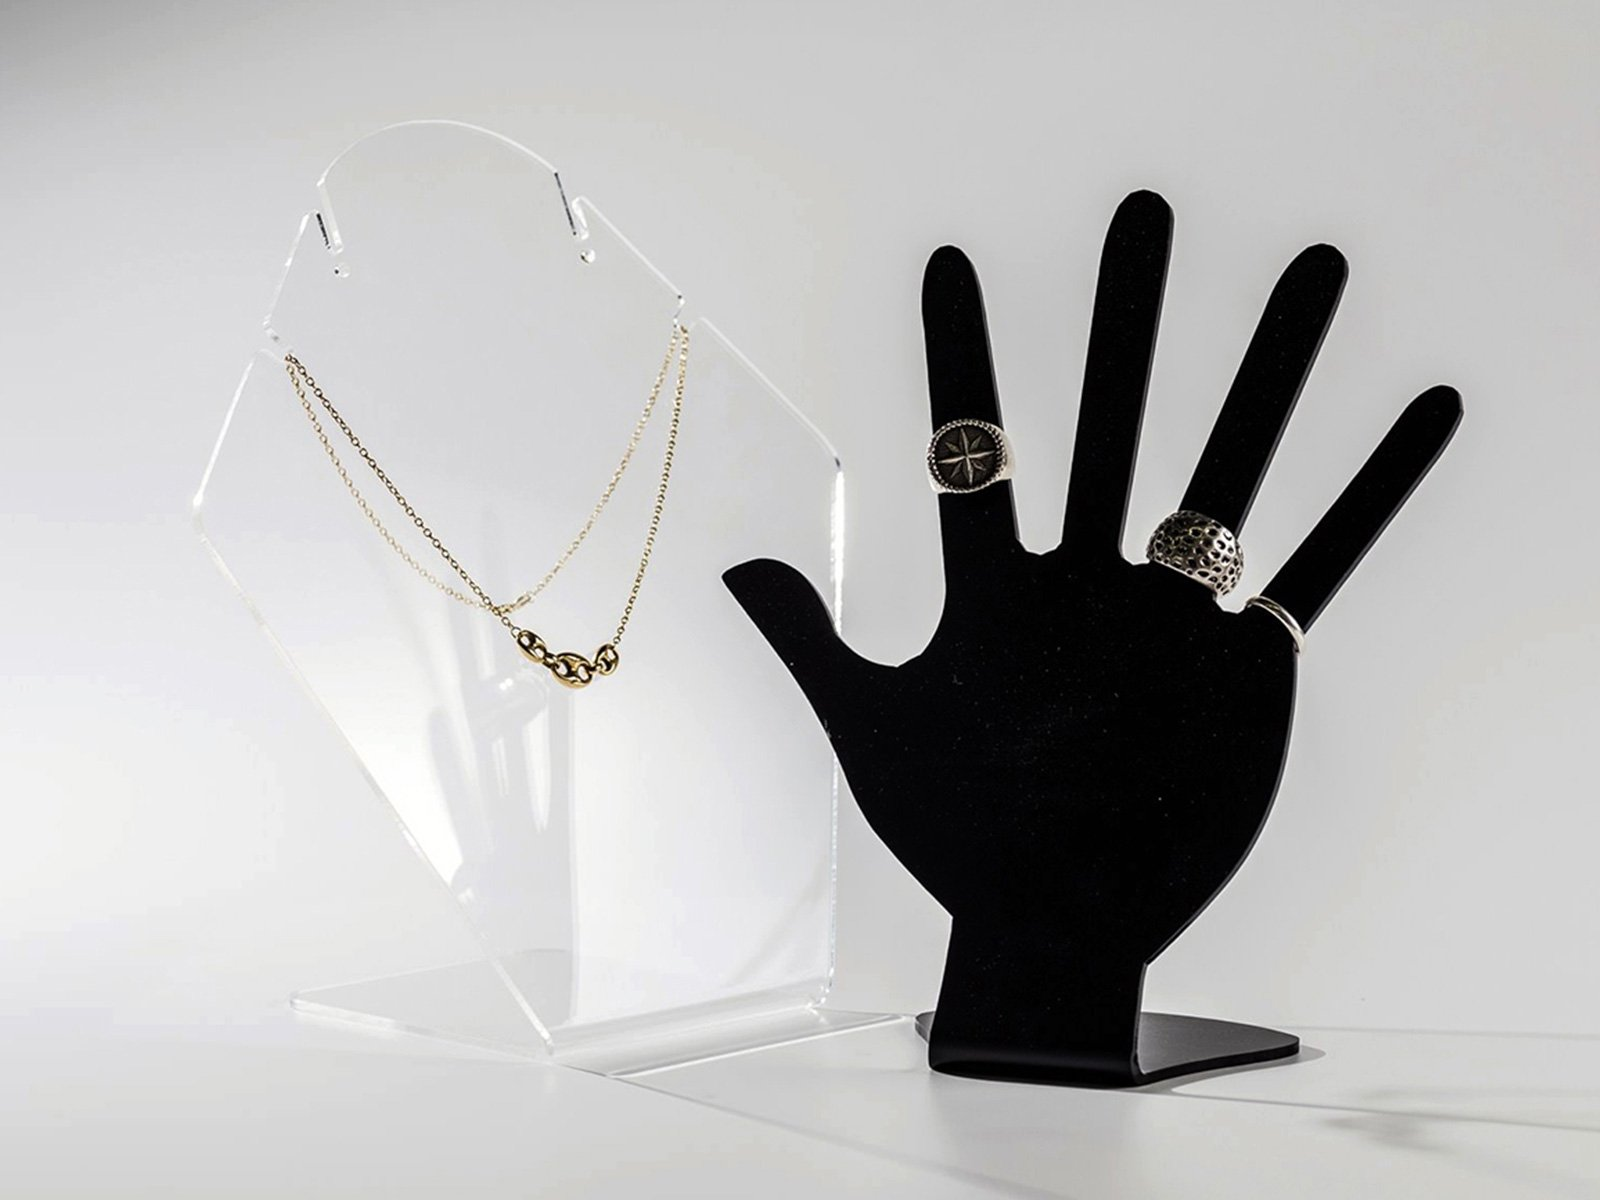 oggetti in plexiglass